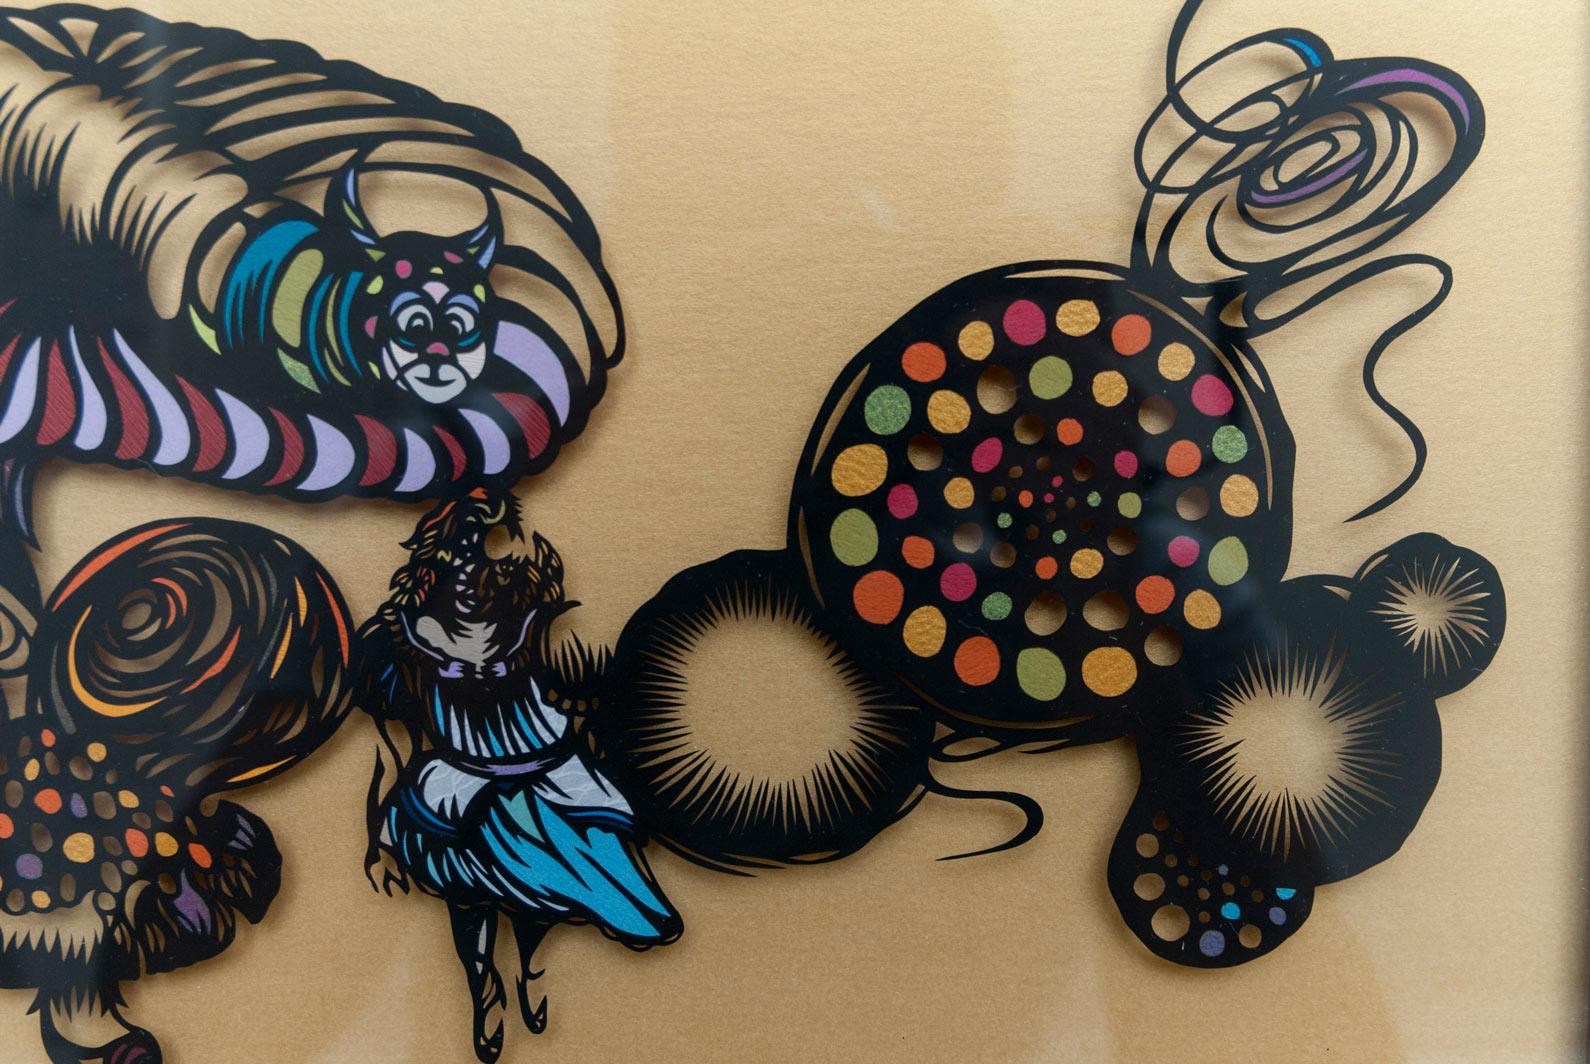 Wall Sculptures PAPER CUT ART buy ALICE-NAHOKO-KOJIMA